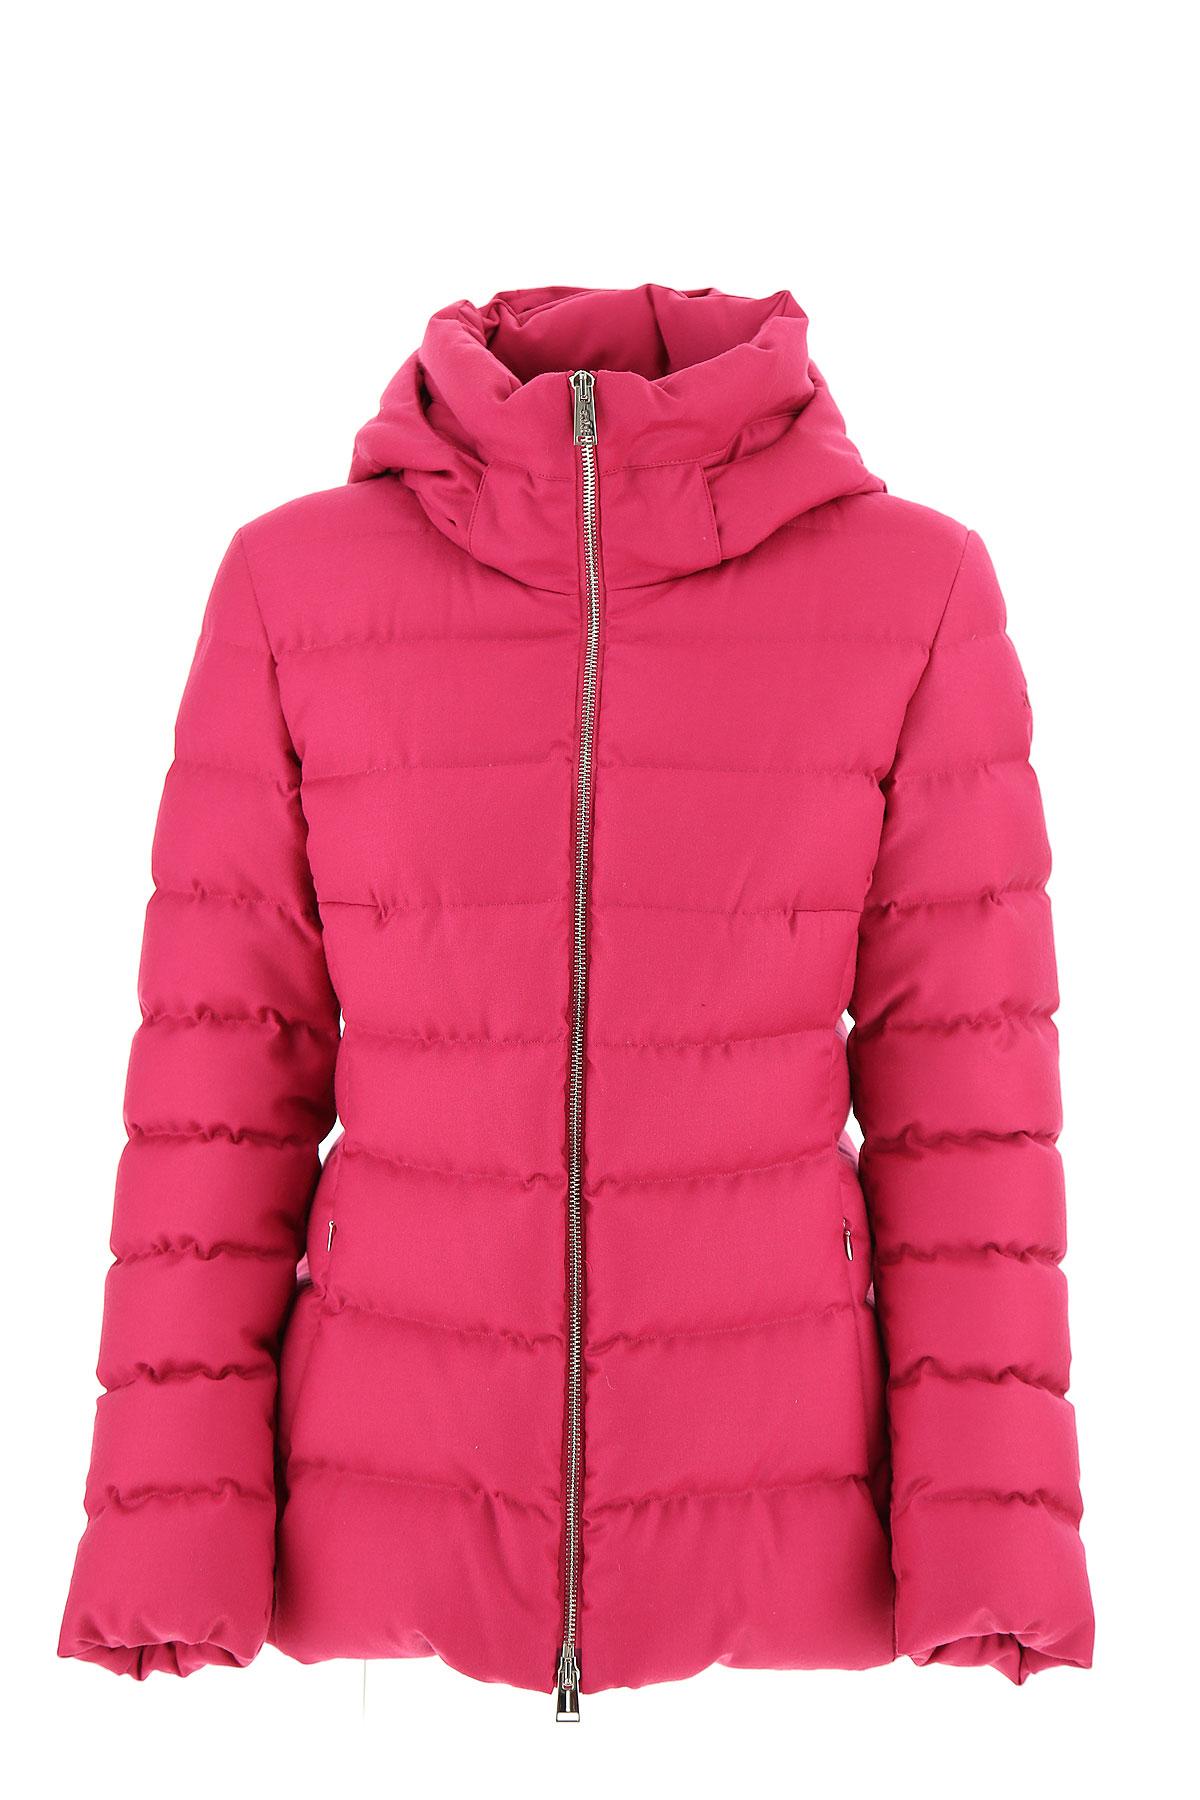 Image of ADD Down Jacket for Women, Puffer Ski Jacket On Sale, Magenta Pink, polyamide, 2017, IT 42 - US 4 - F 38 IT 44 - US 6 - F 40 IT 46 - US 8 - F 42